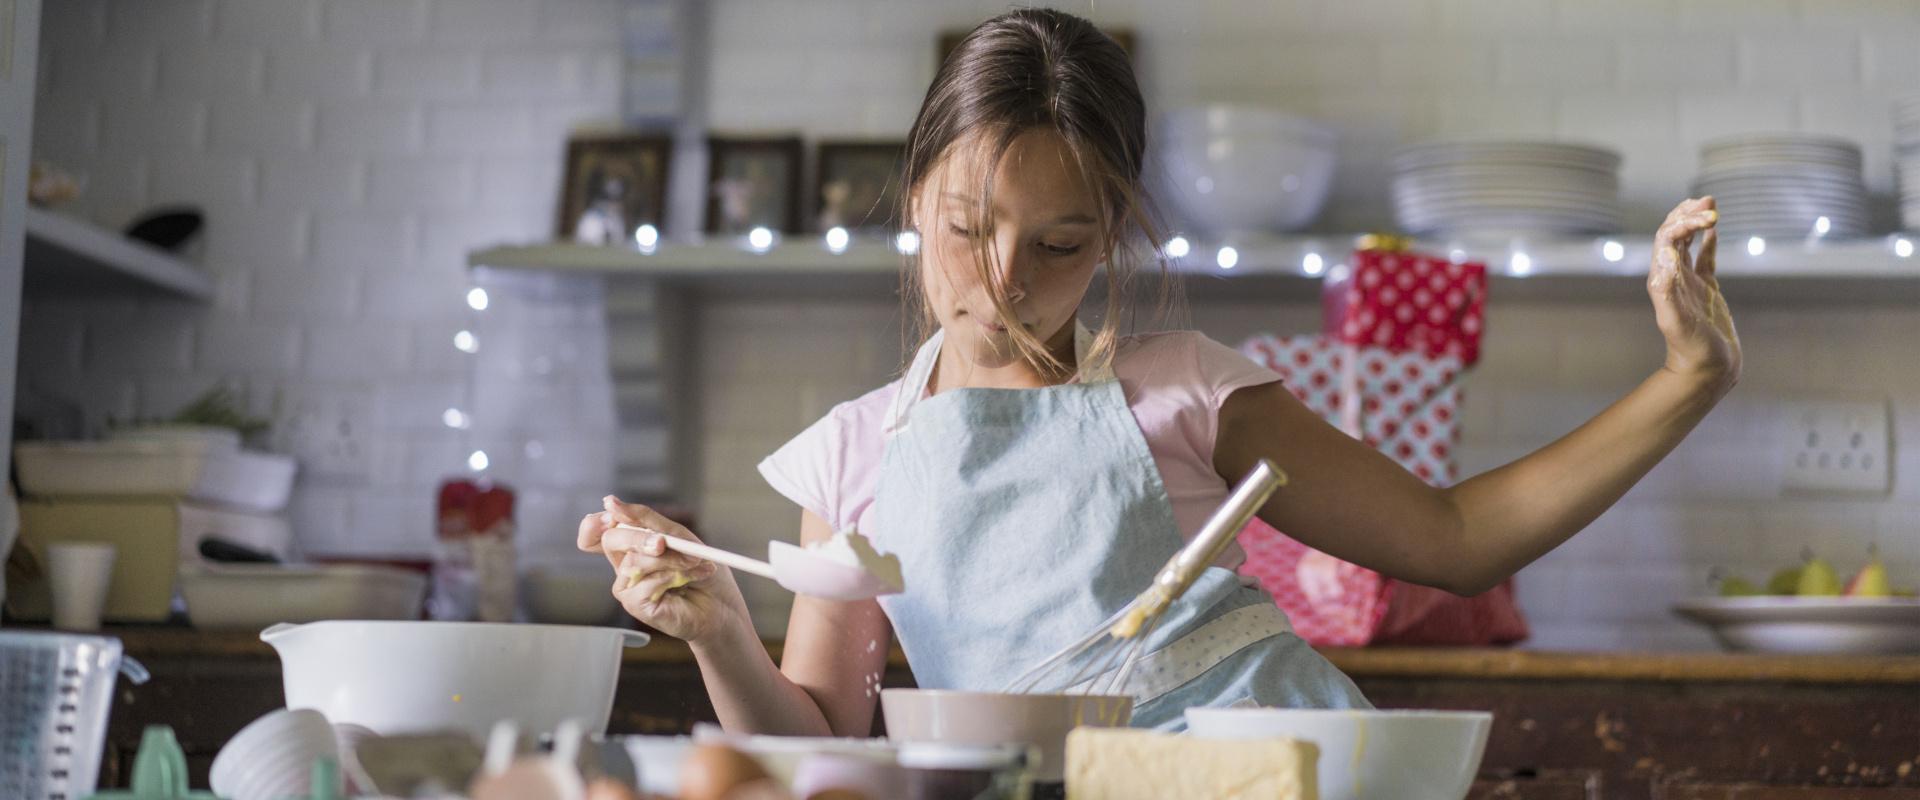 gyerek főz